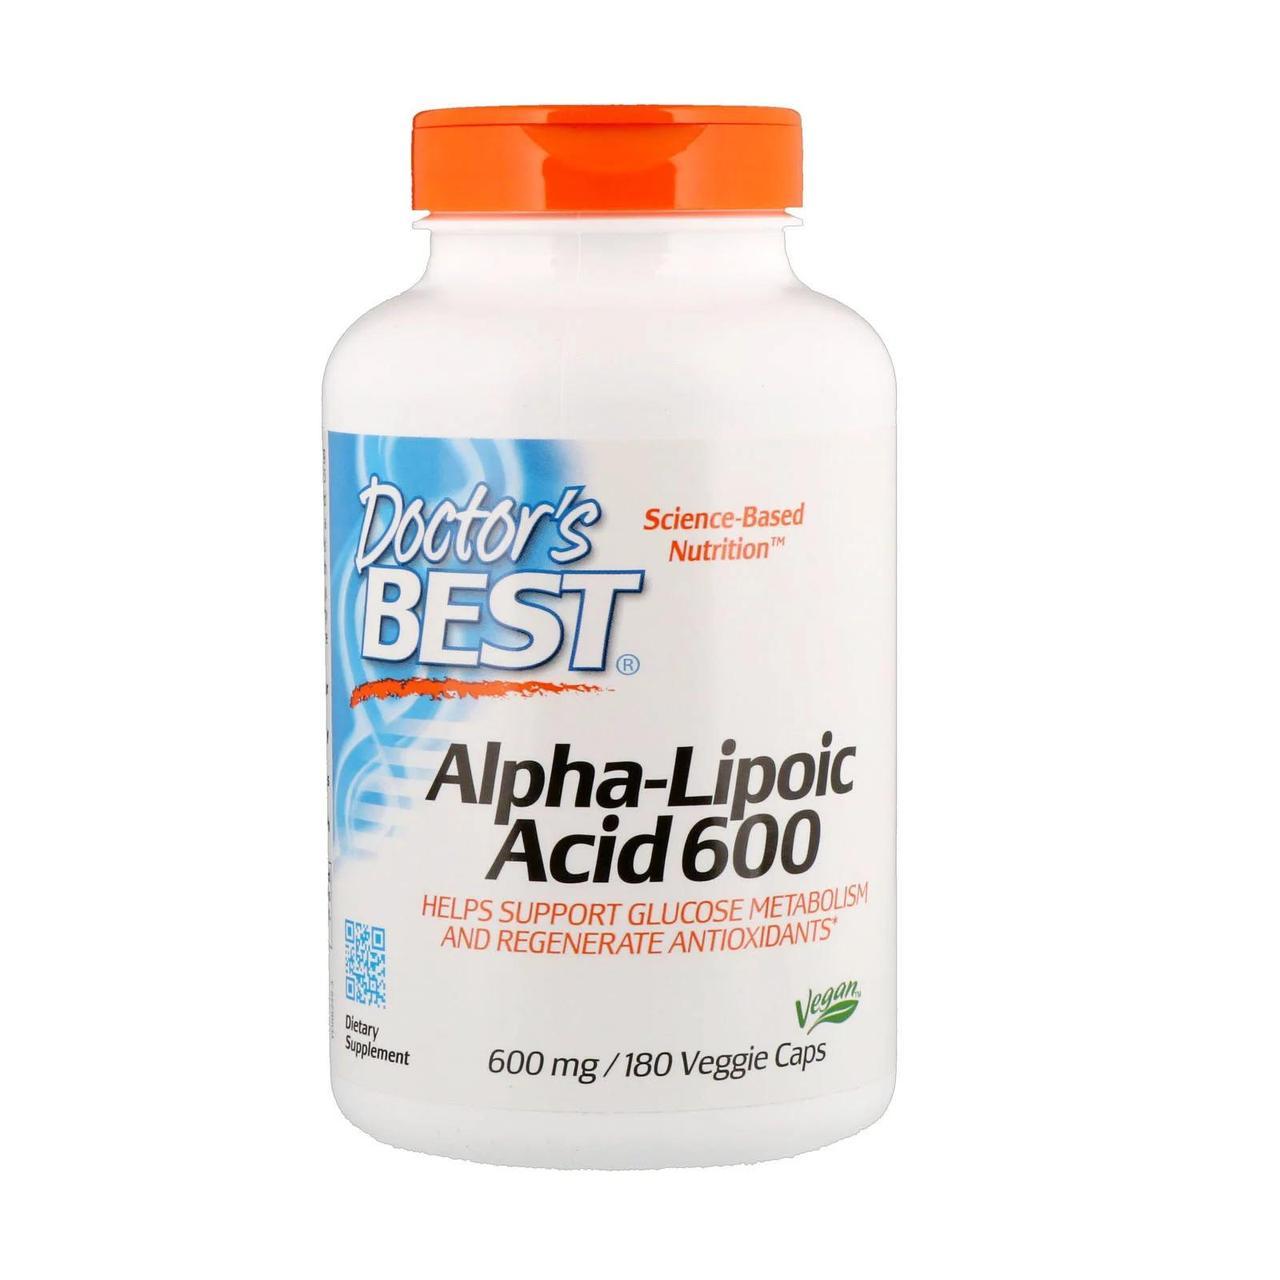 Альфа-липоевая кислота, 600 мг, 180 капсул, Doctor's Best